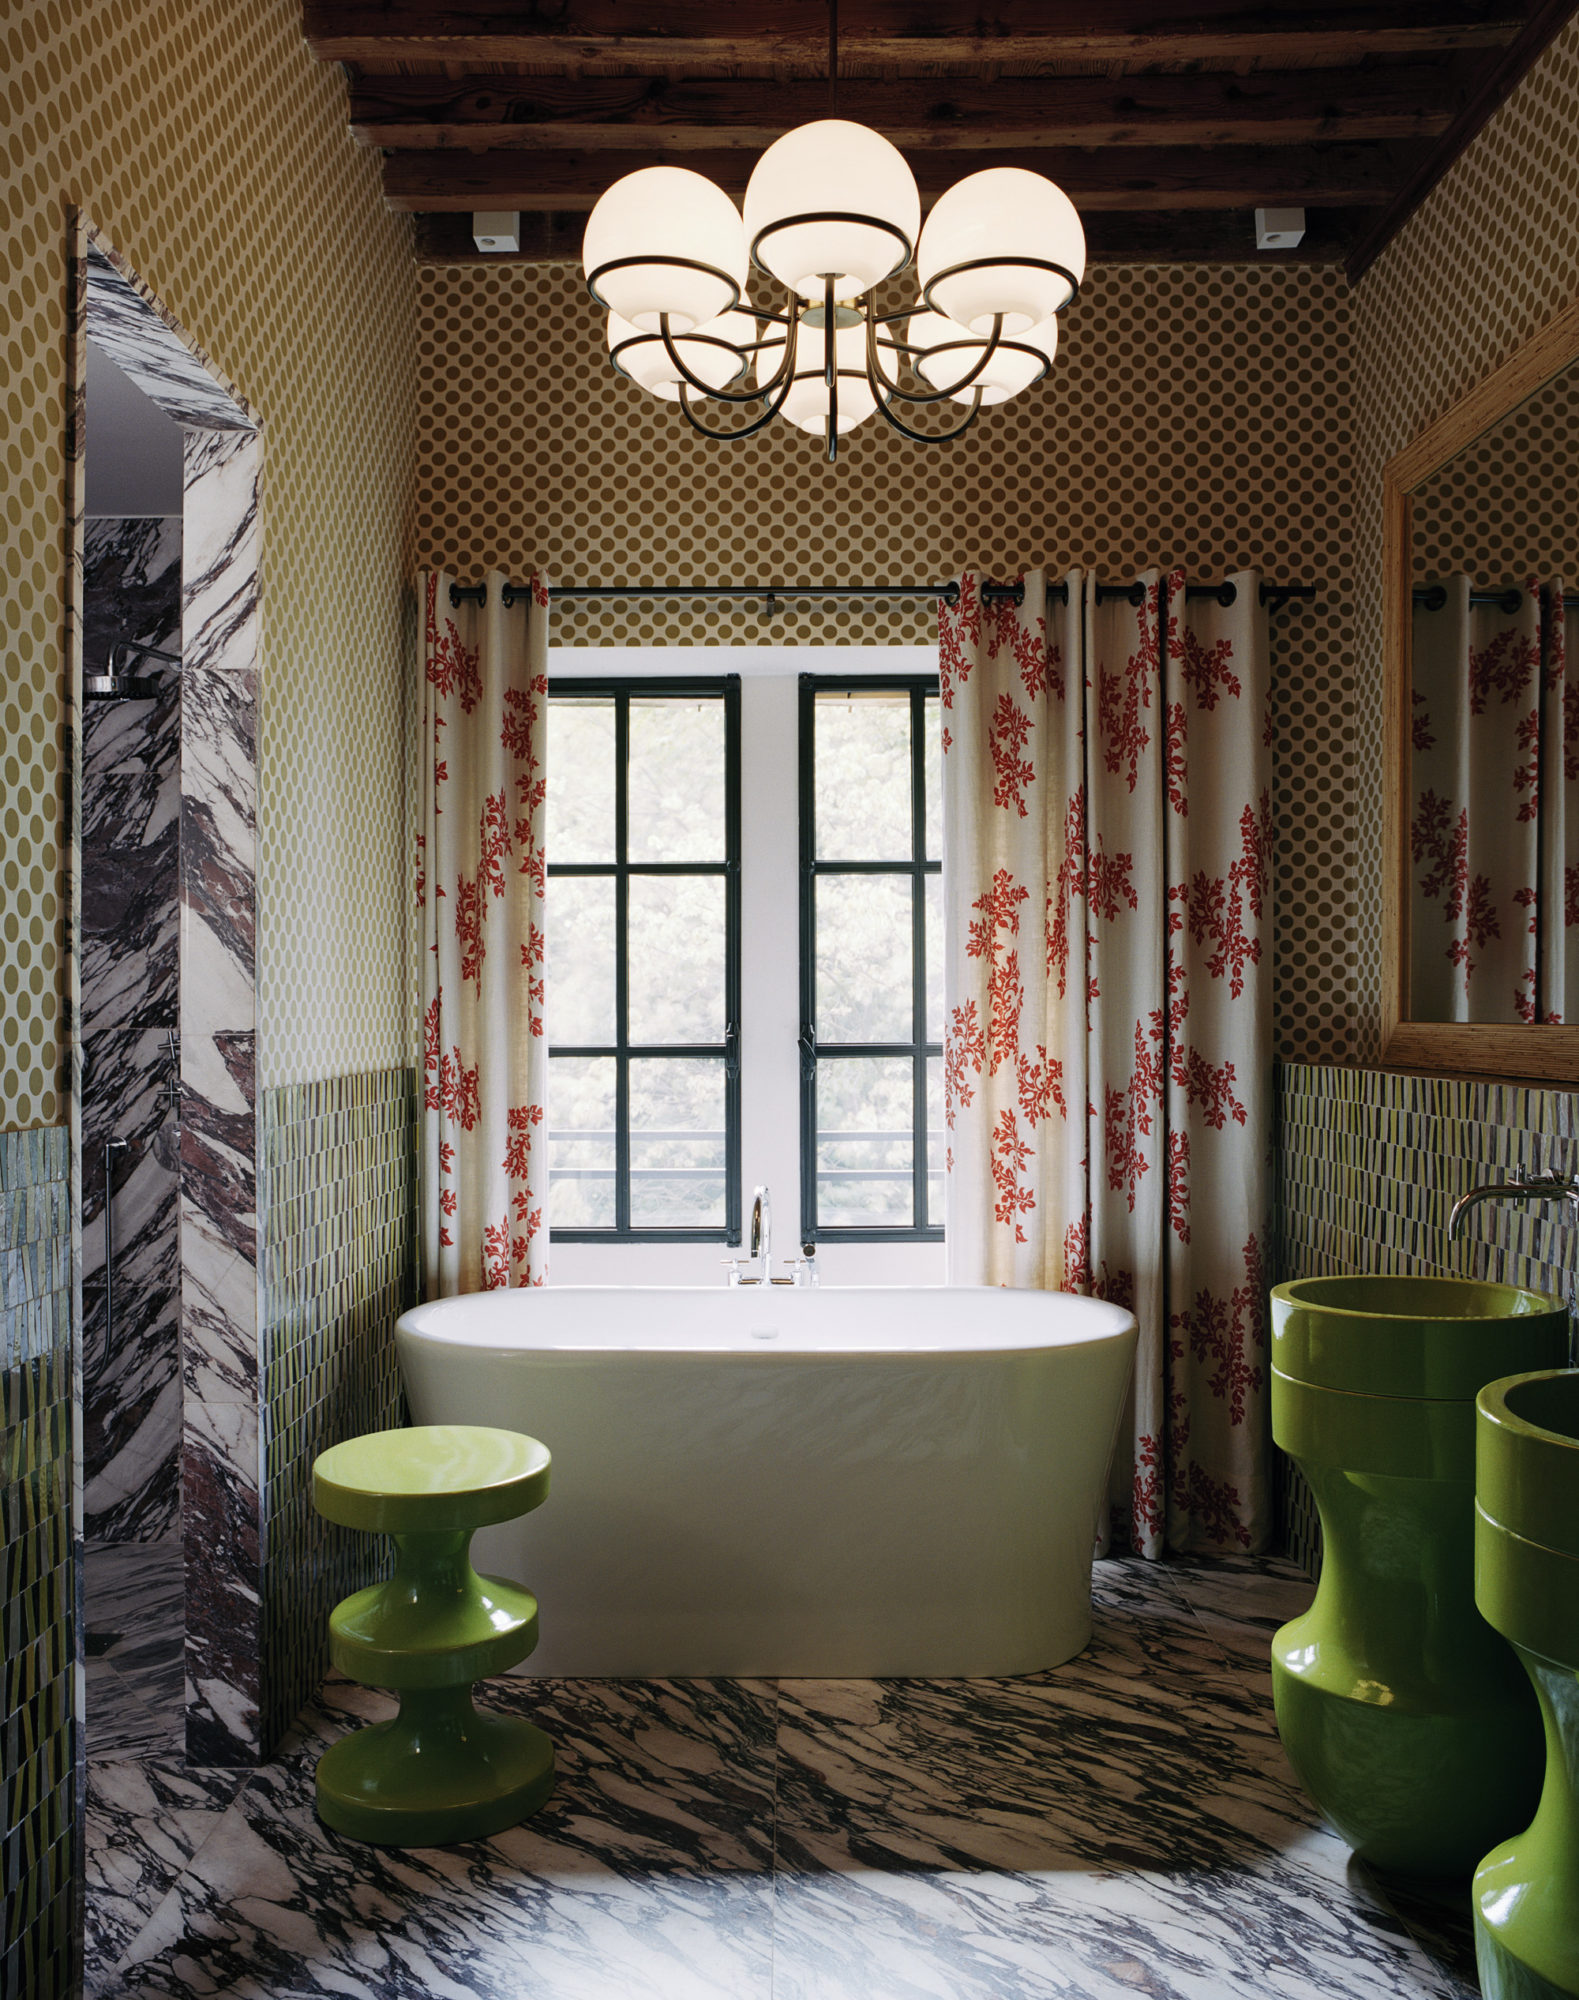 Villa des Alyscamps - India Mahdavi